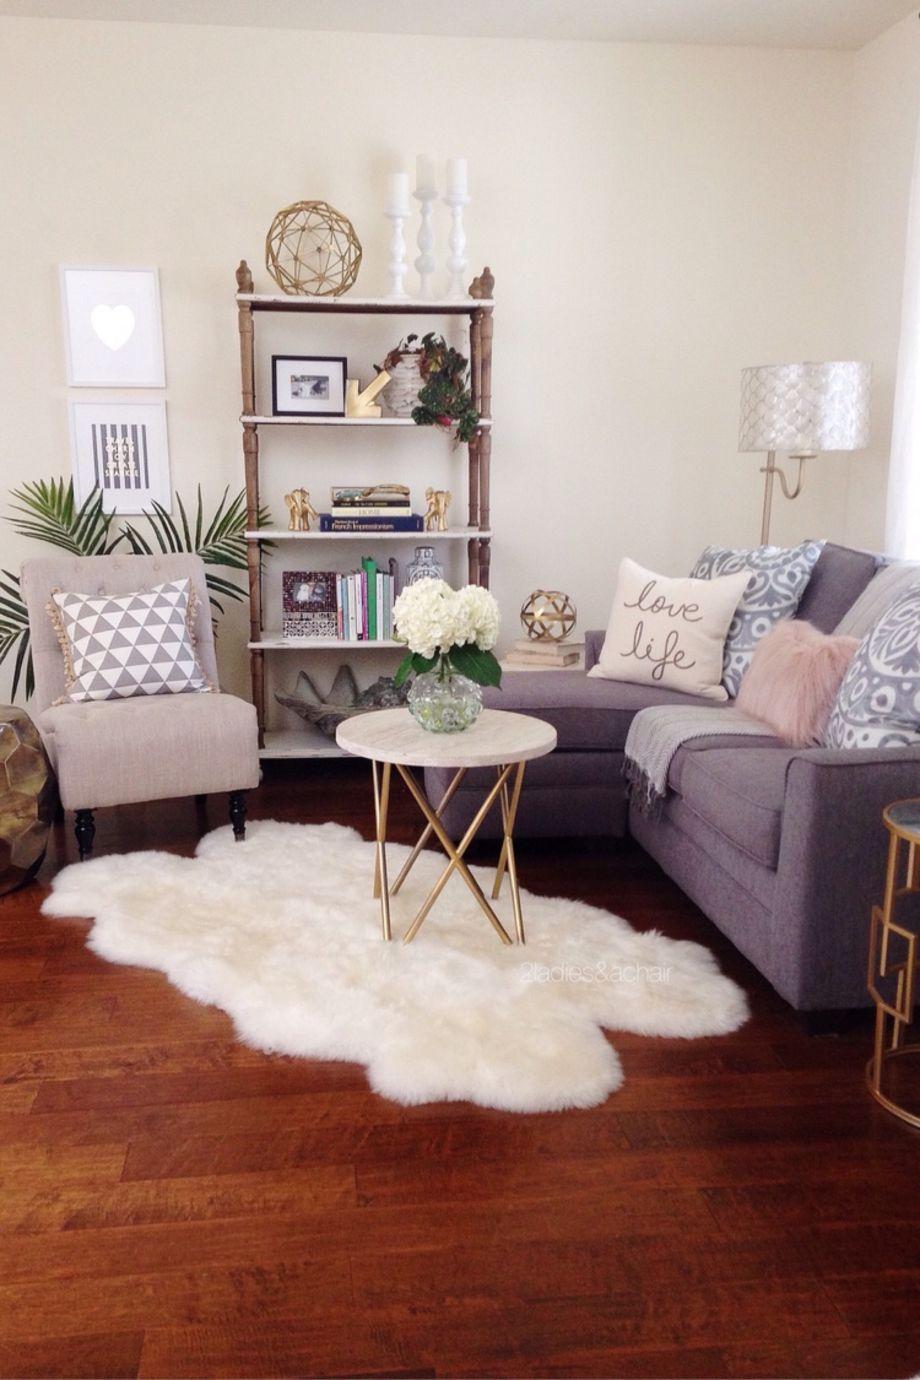 Cool 71 Stunning Apartment Studio Decor Ideas Https Homedecort Com 2017 07 Living Room Decor Apartment Small Apartment Living Room First Apartment Decorating